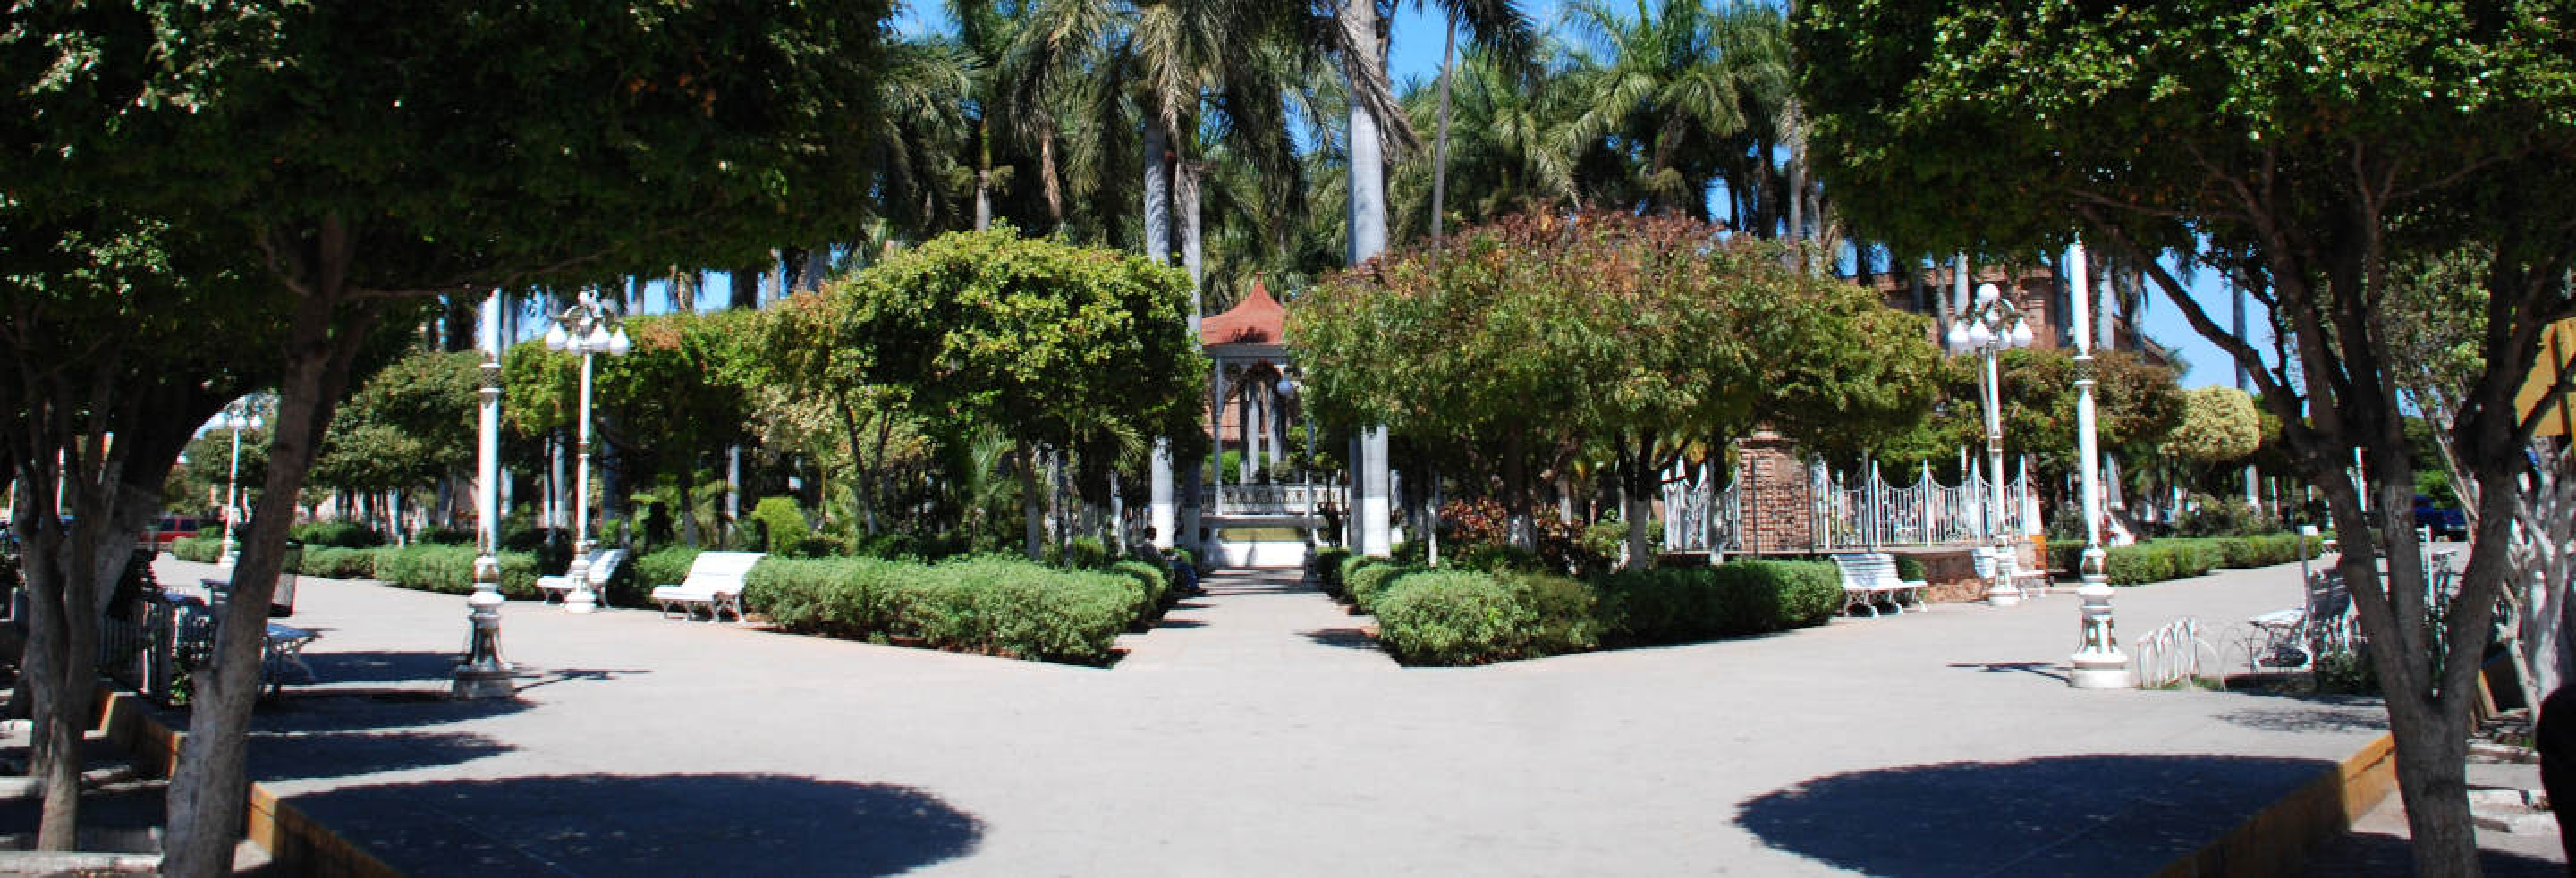 Tour por Los Mochis + Paseo en lancha por la bahía de Topolobampo